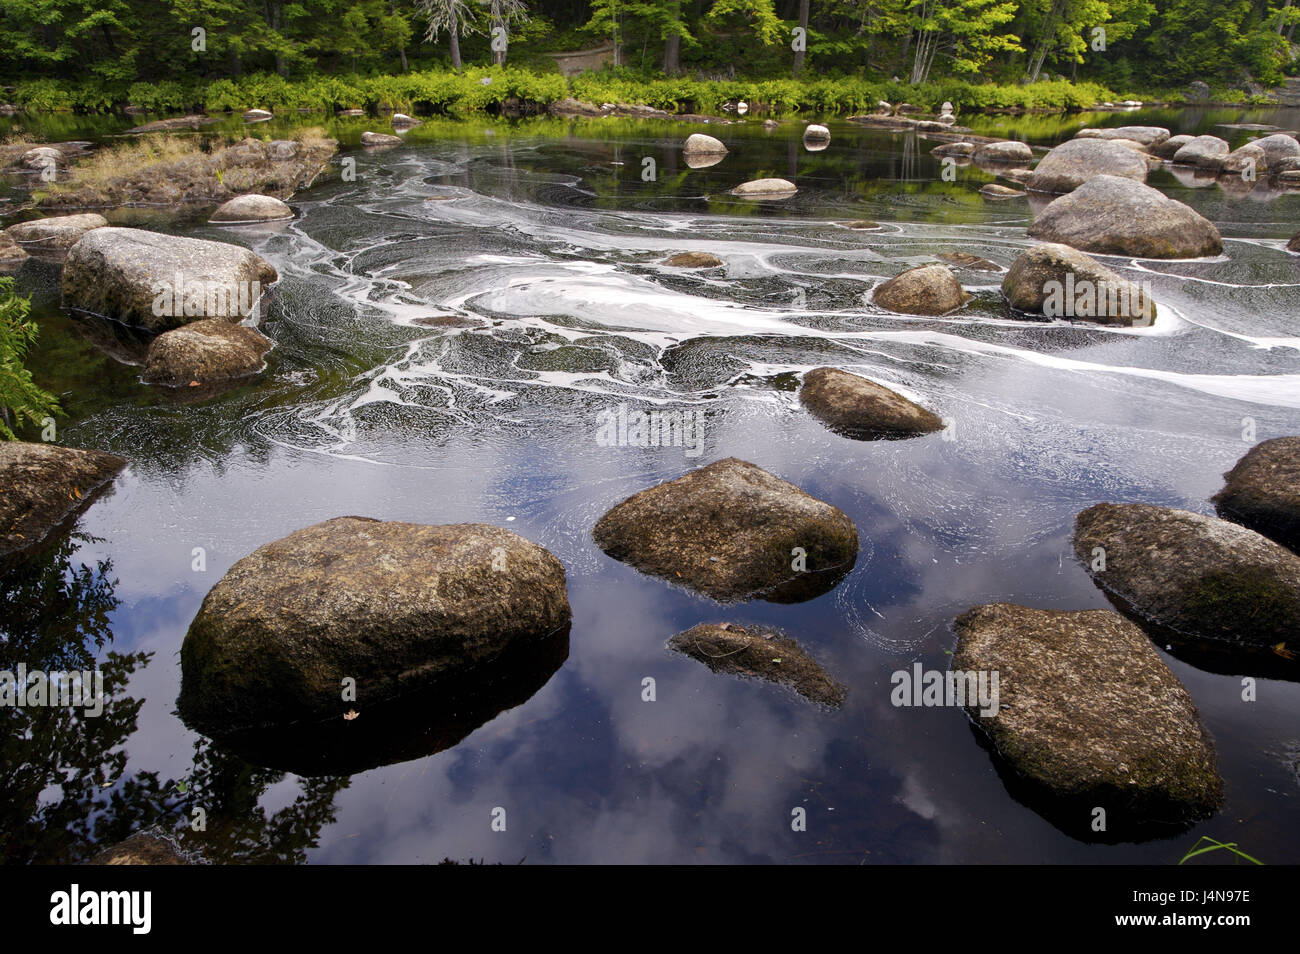 Flux, bile lump, Mersey River, million cases, Kejimkujik Nationwide park, Nova Scotia, Canada, - Stock Image